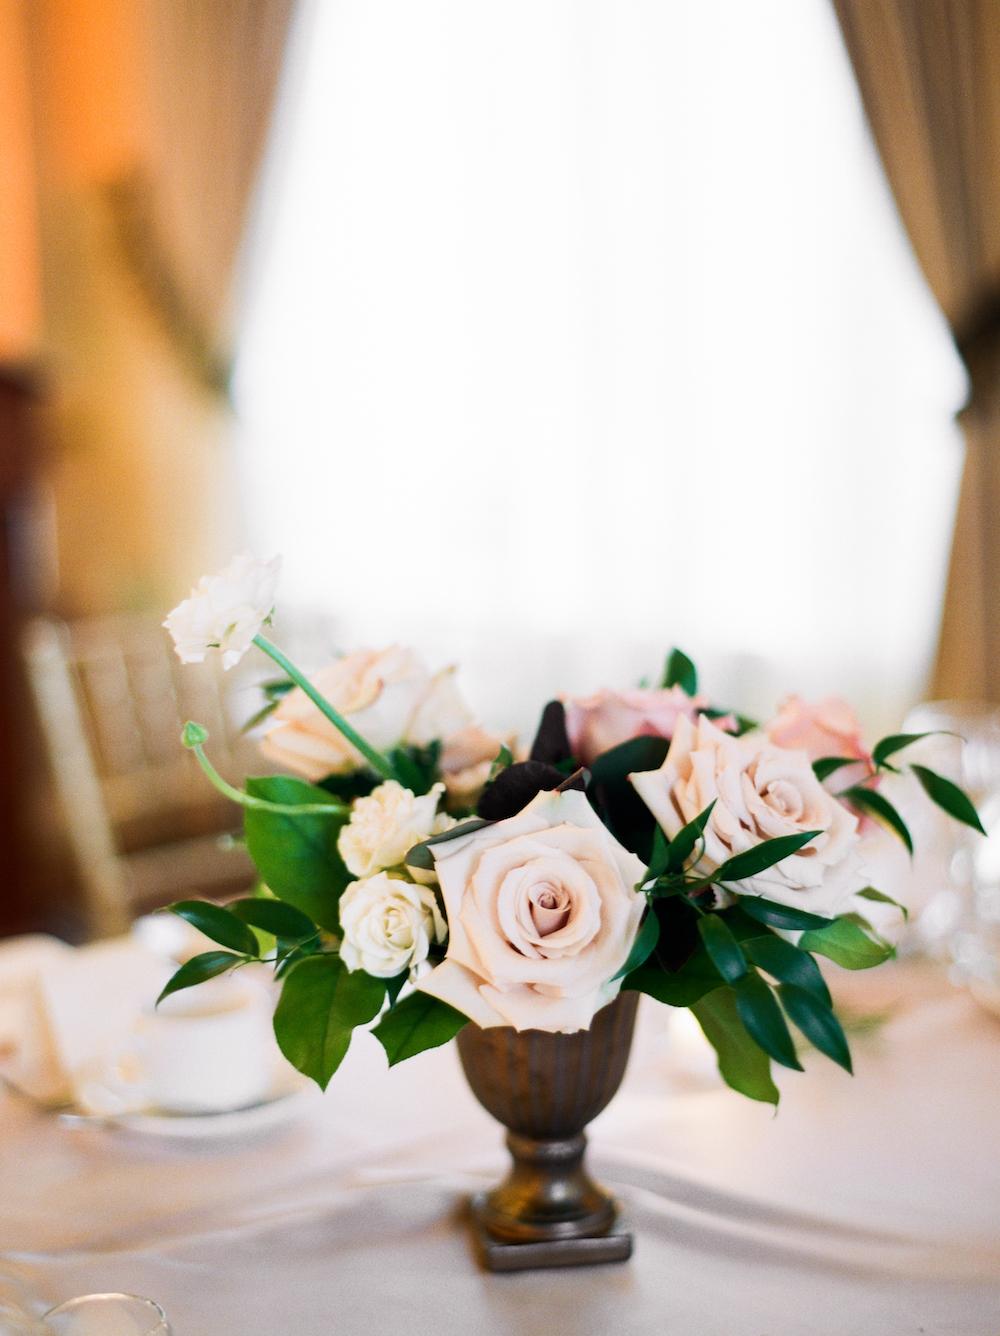 Classic Wedding Flowers - Rose Wedding Centerpiece